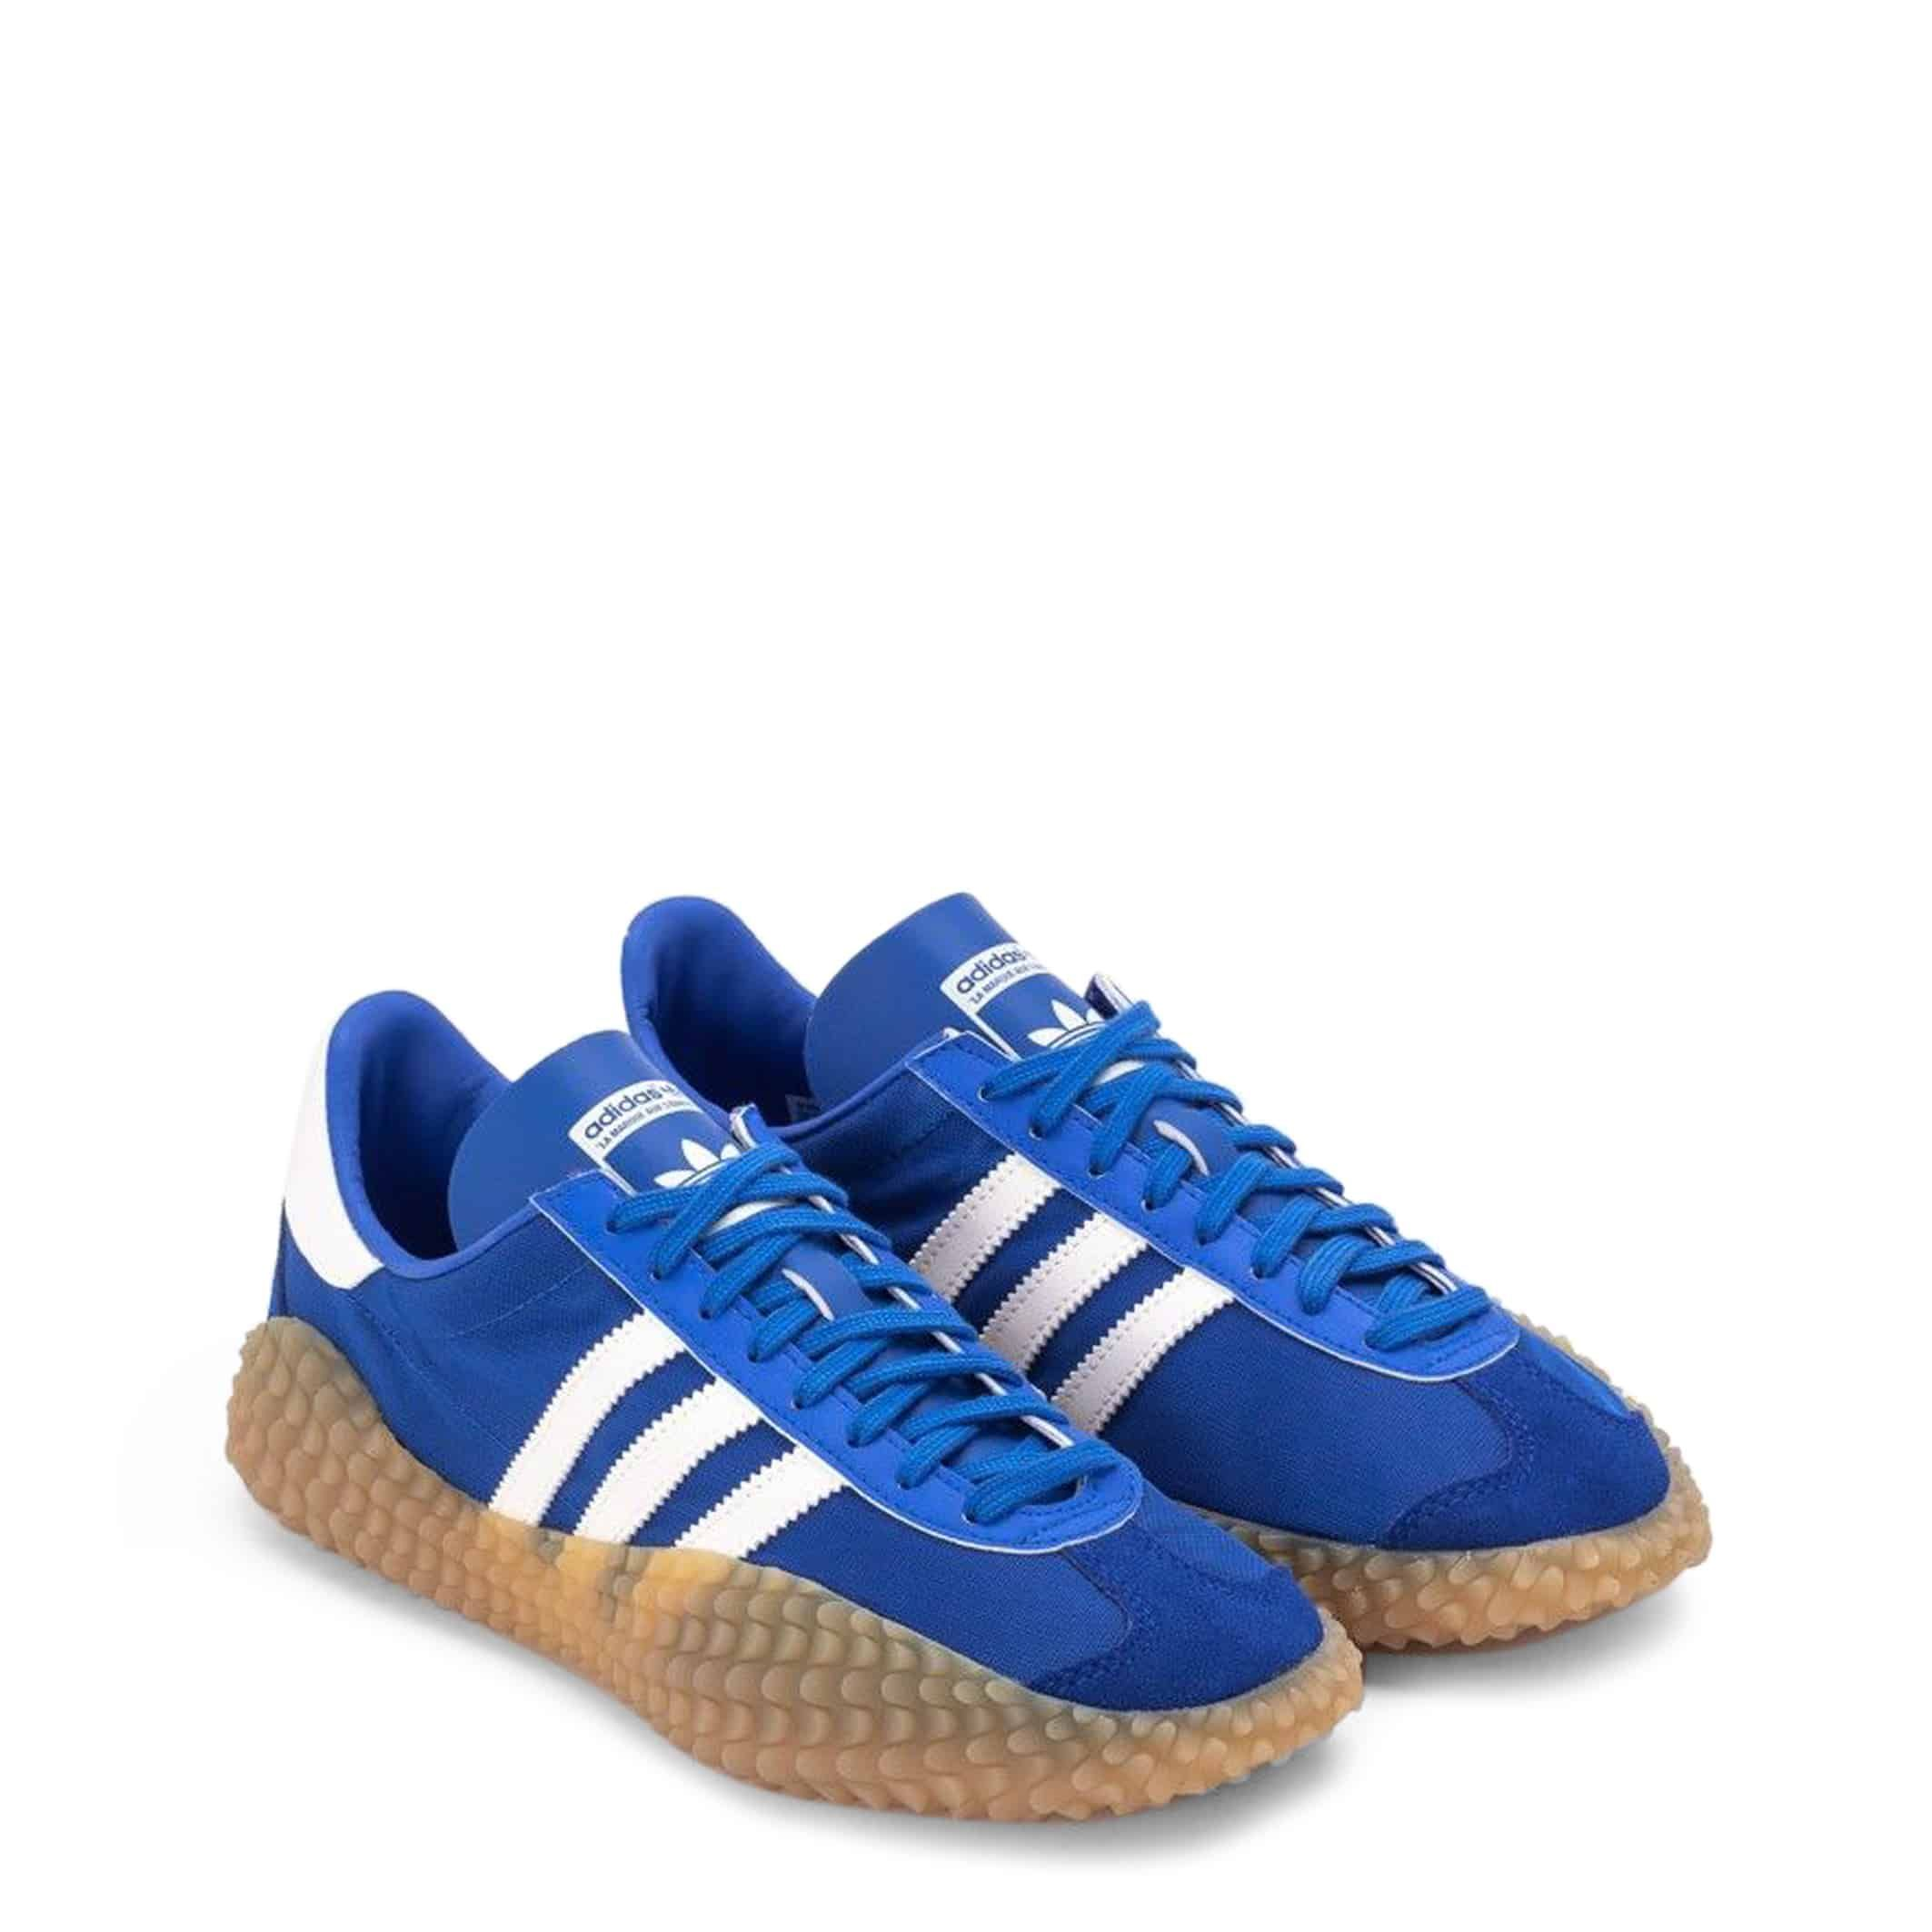 Adidas - CountryxKamanda  | You Fashion Outlet